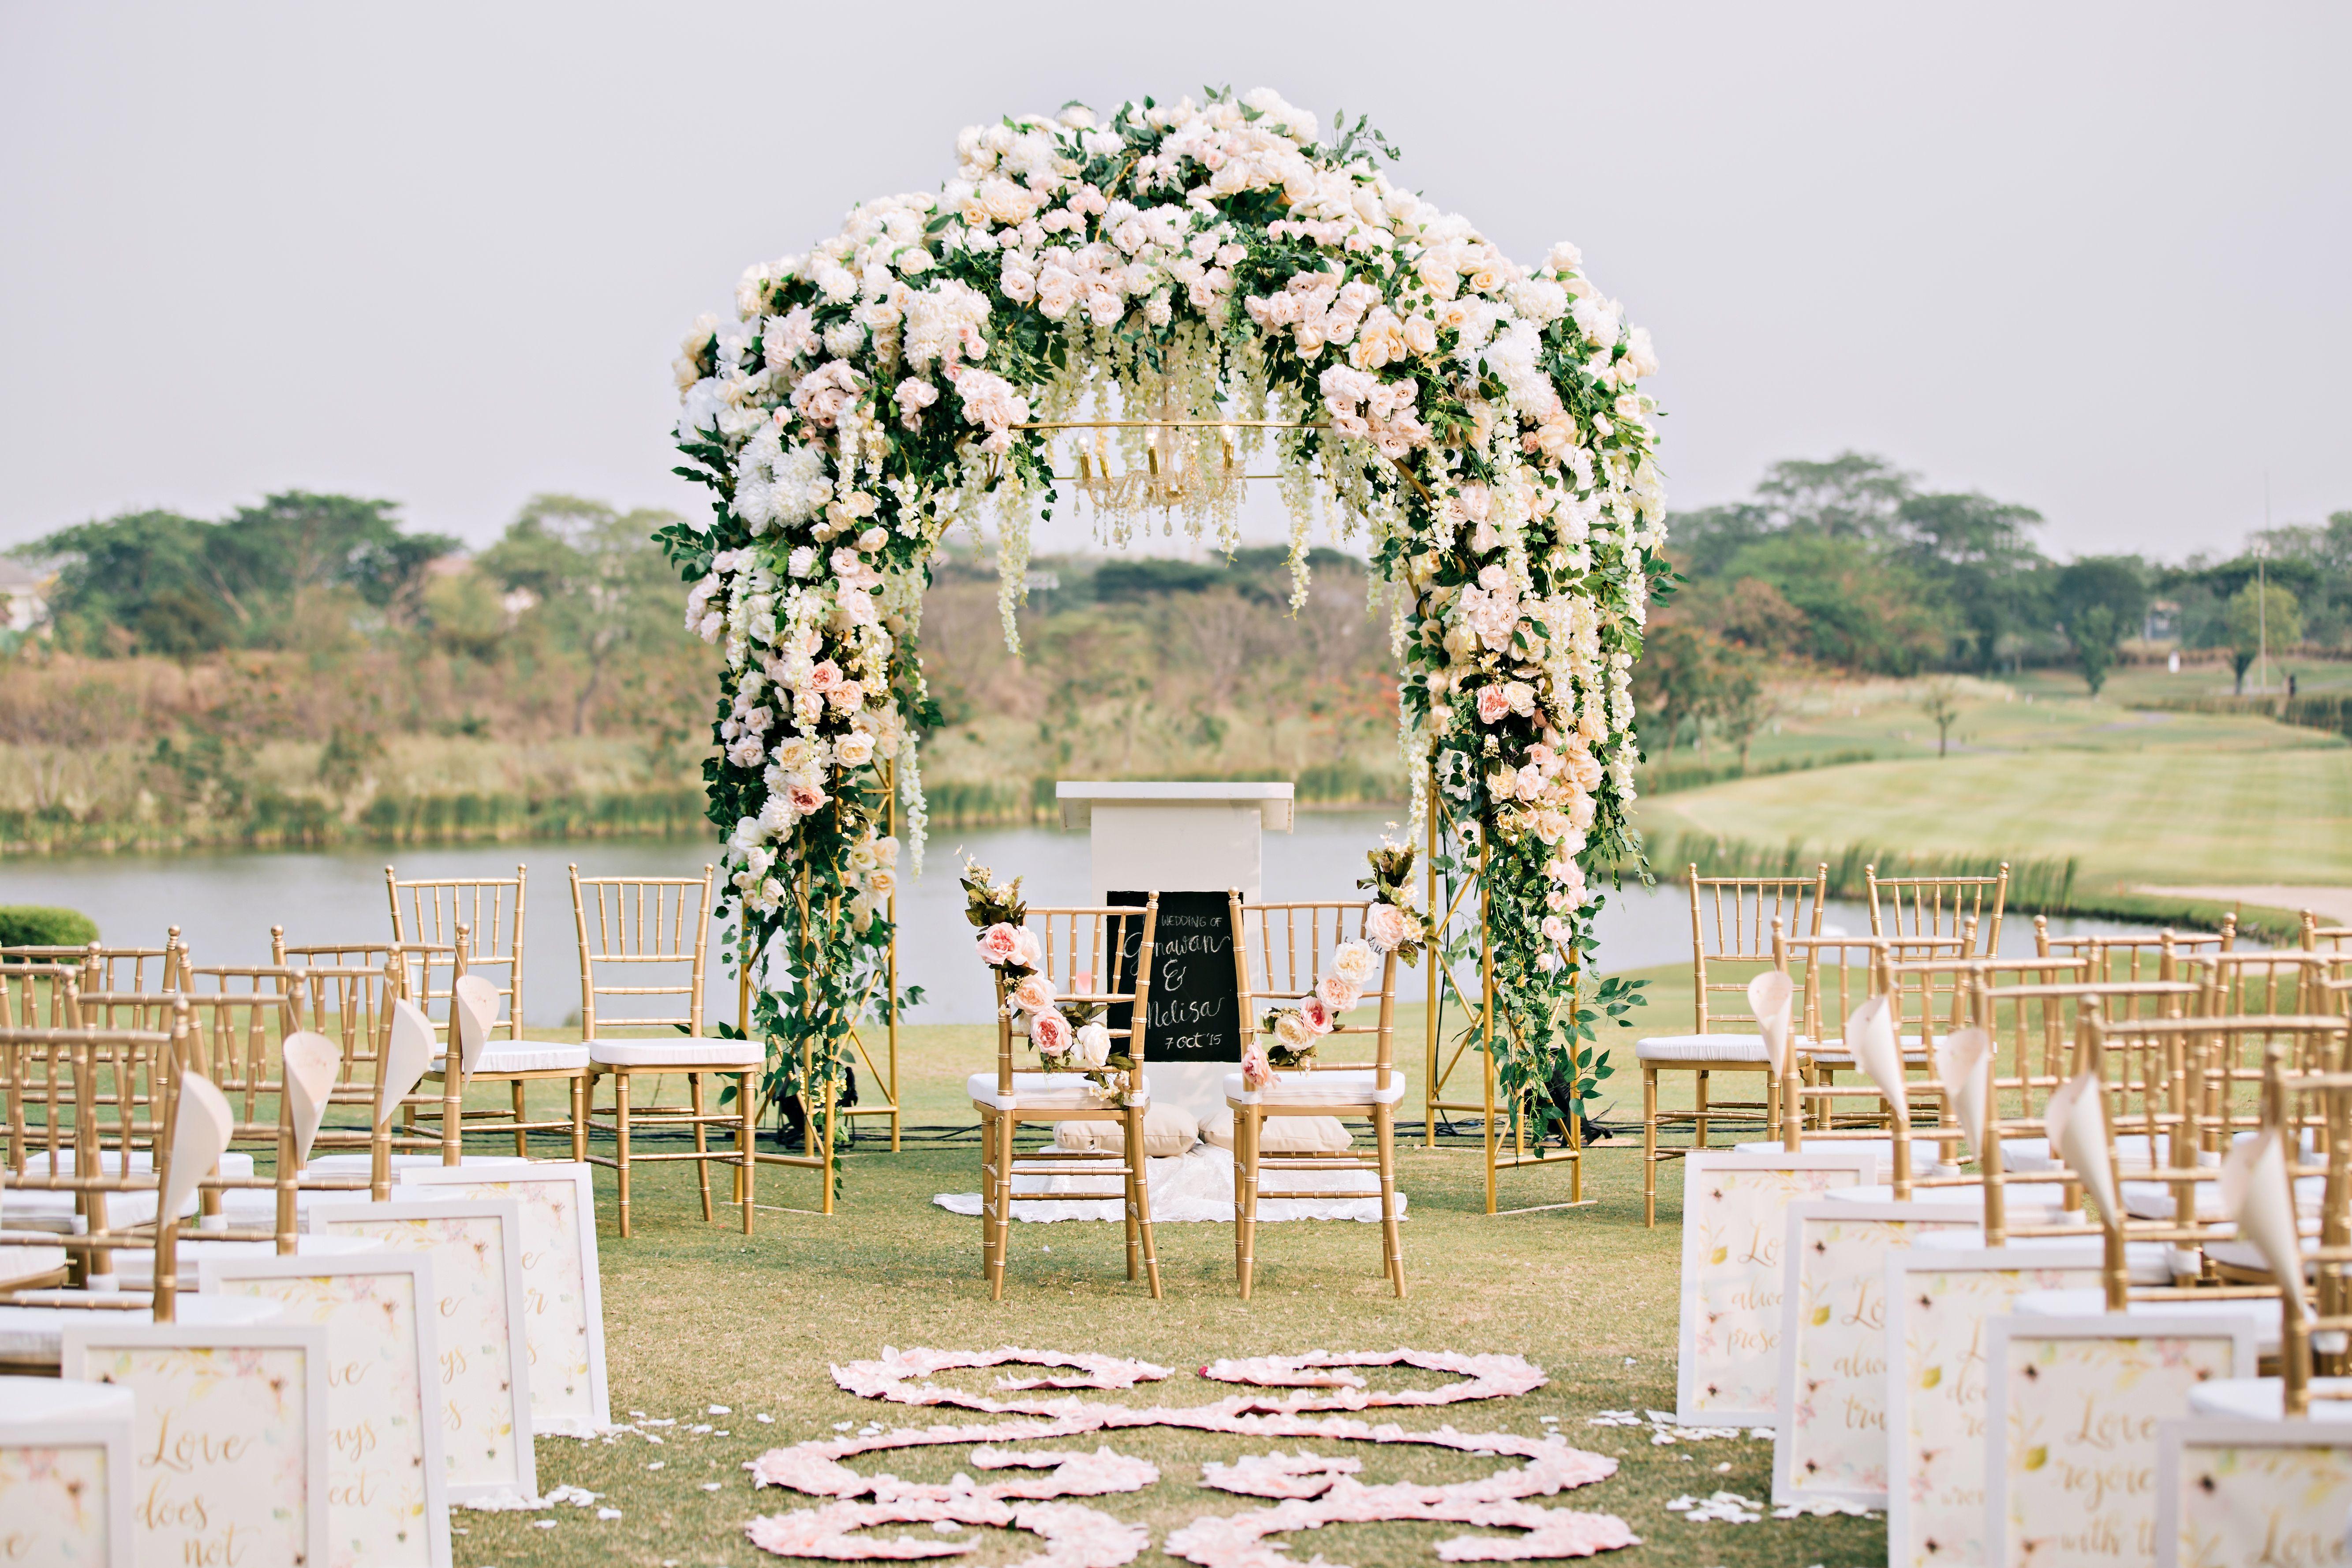 Eden design wedding decoration lighting in surabaya eden design wedding decoration lighting in surabaya bridestory junglespirit Images